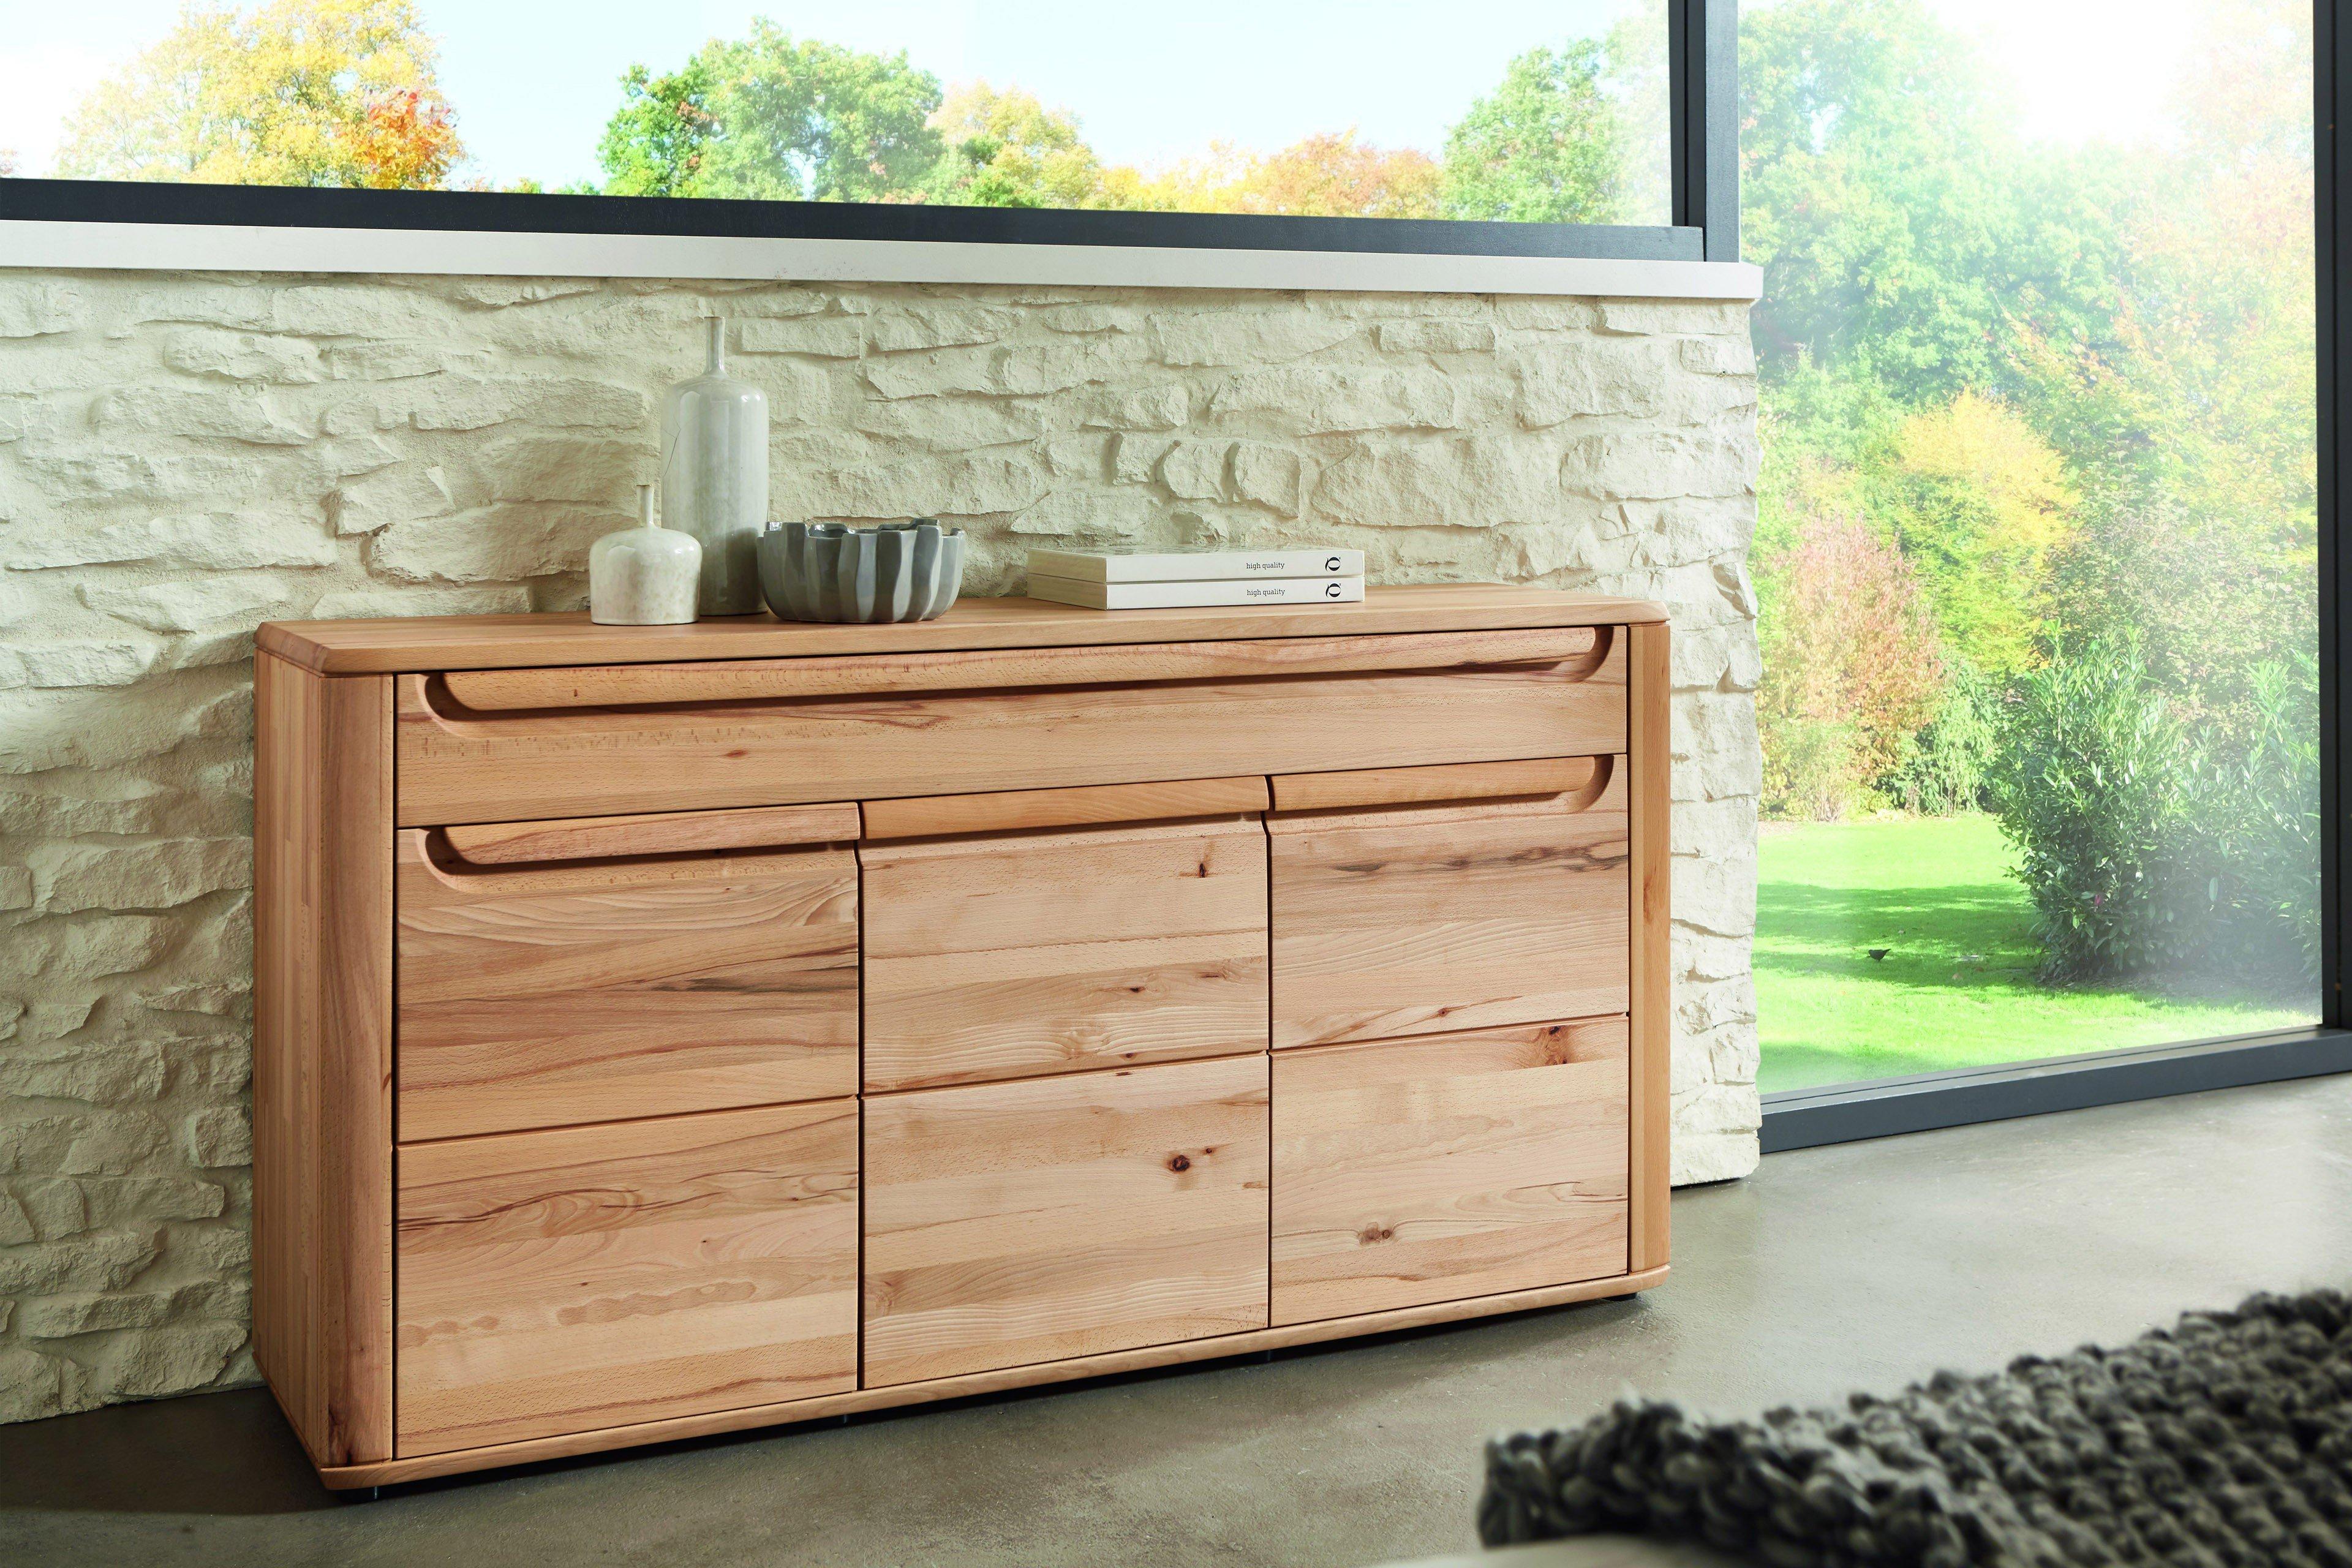 w stmann wsm 2300 kommode kernbuche ge lt m bel letz ihr online shop. Black Bedroom Furniture Sets. Home Design Ideas